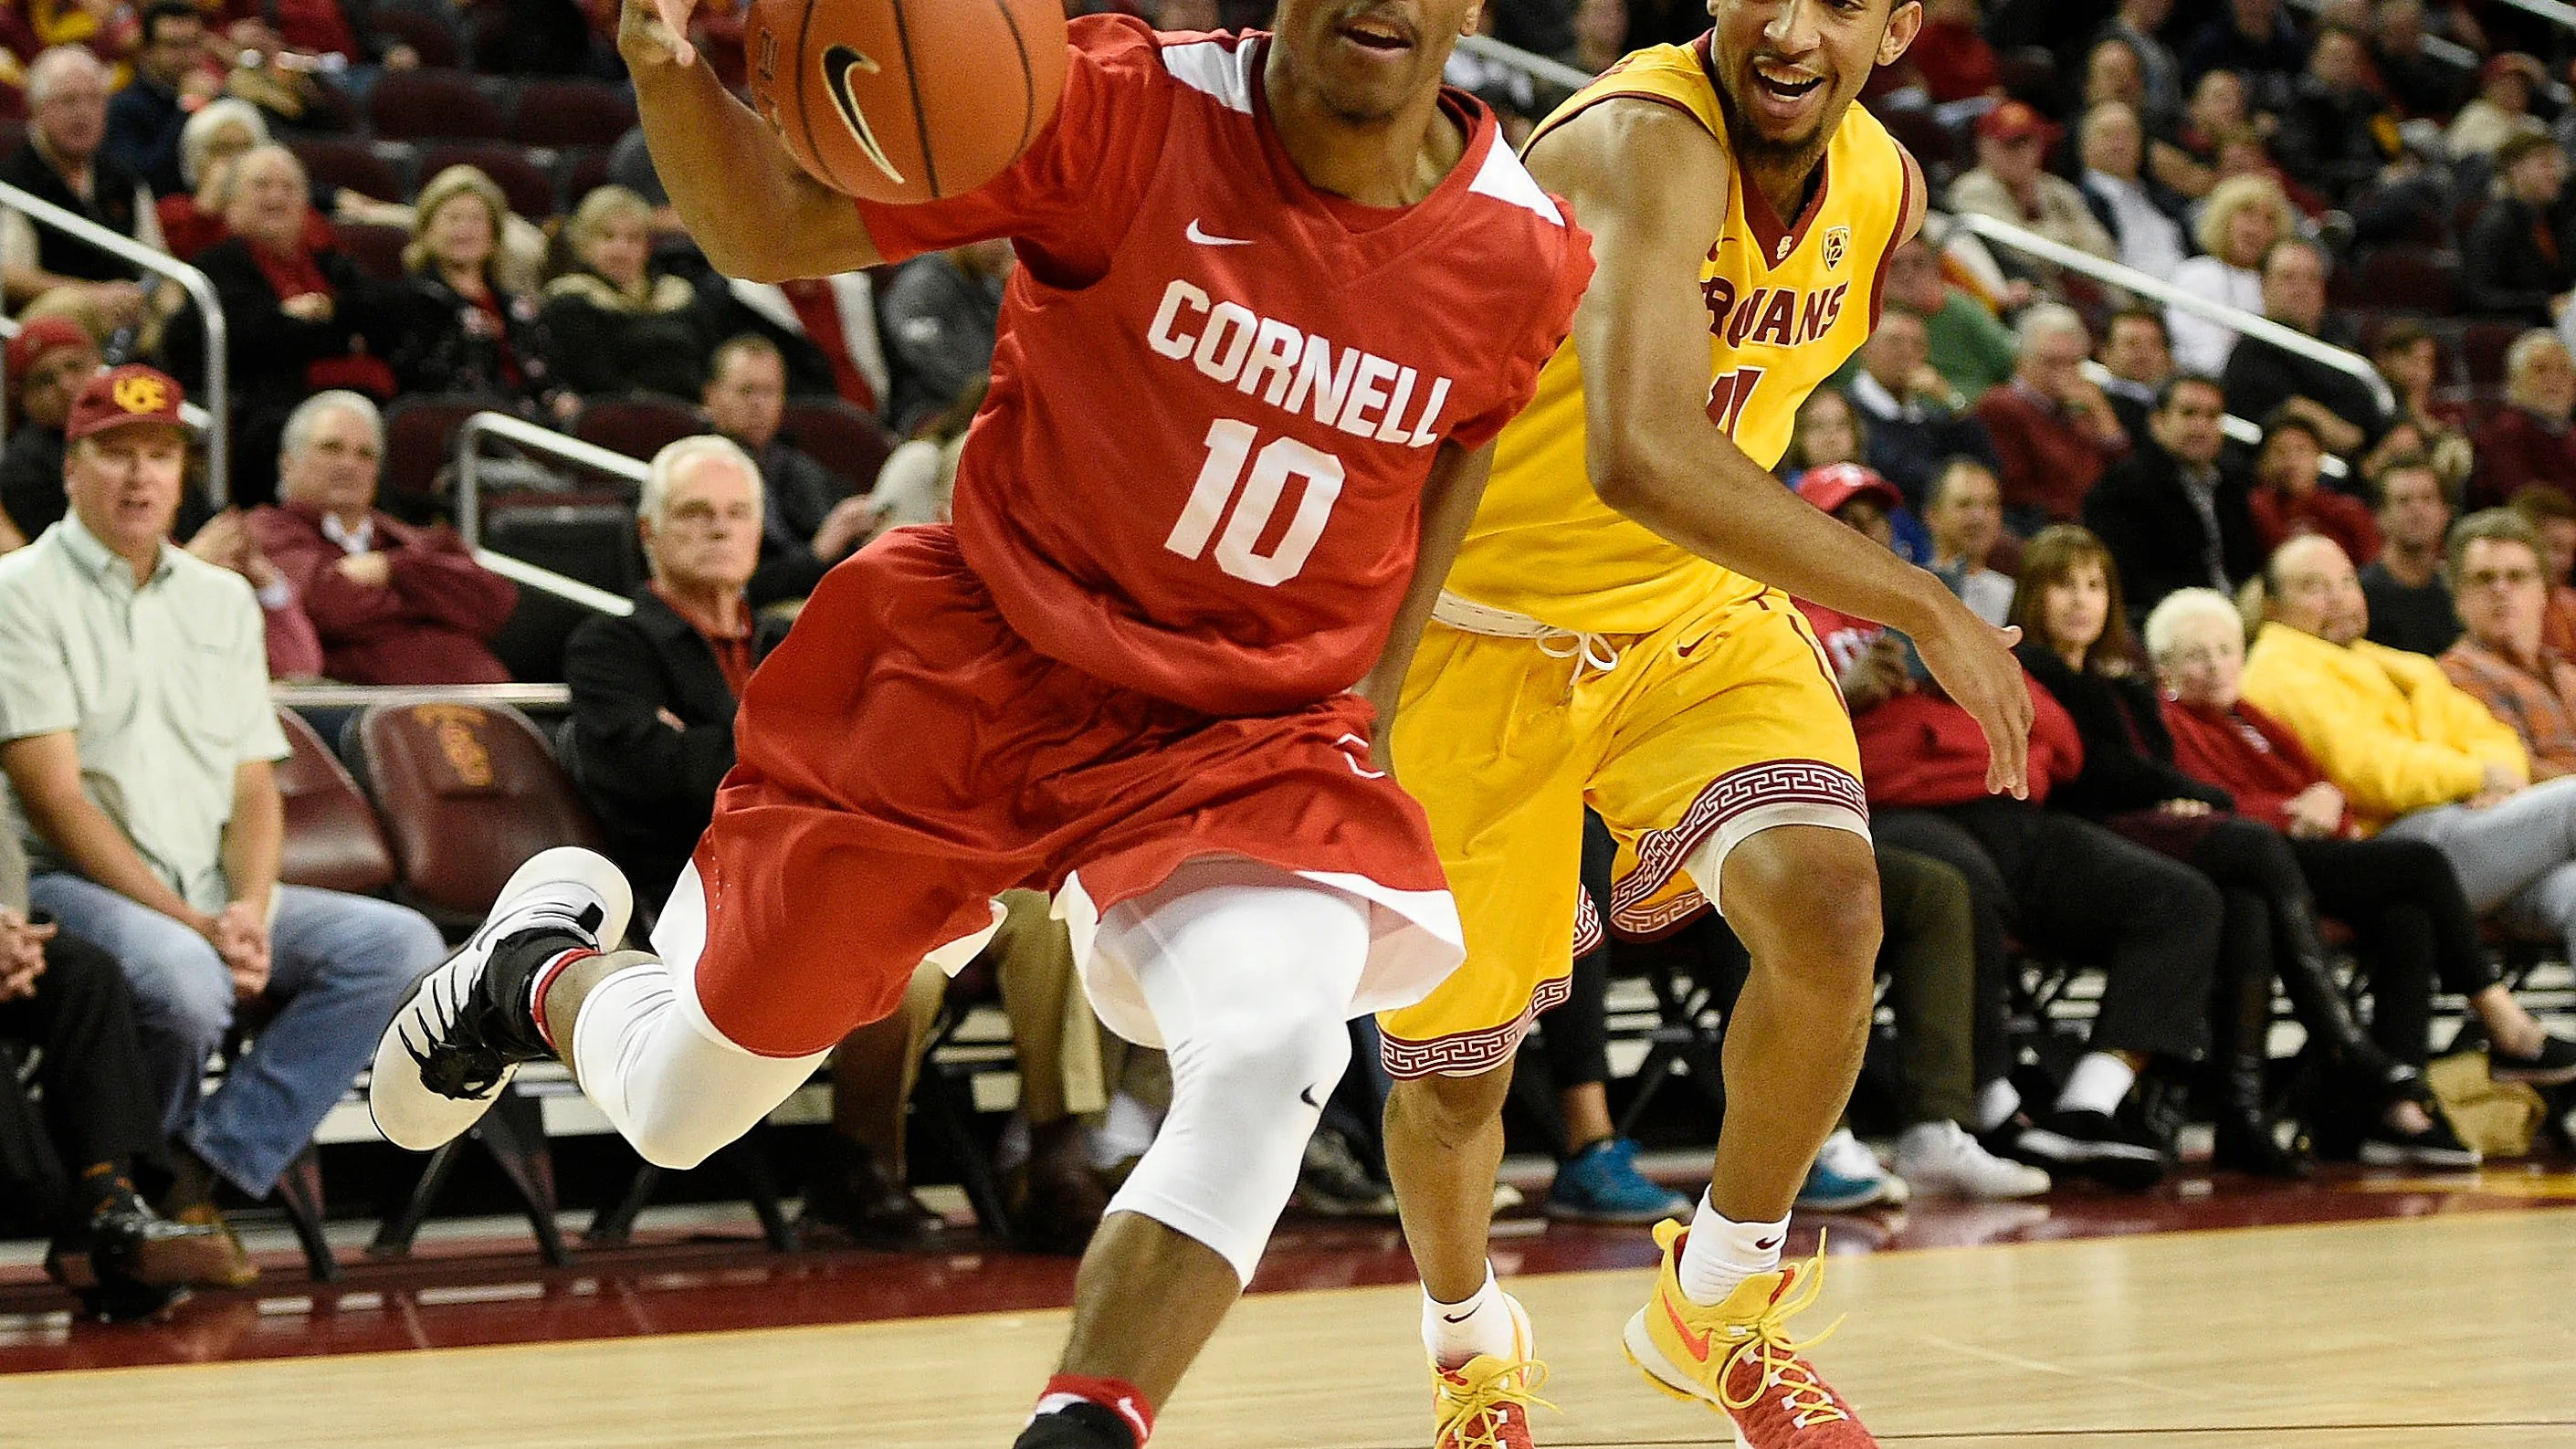 Cornell men's basketball schedule 2018-19